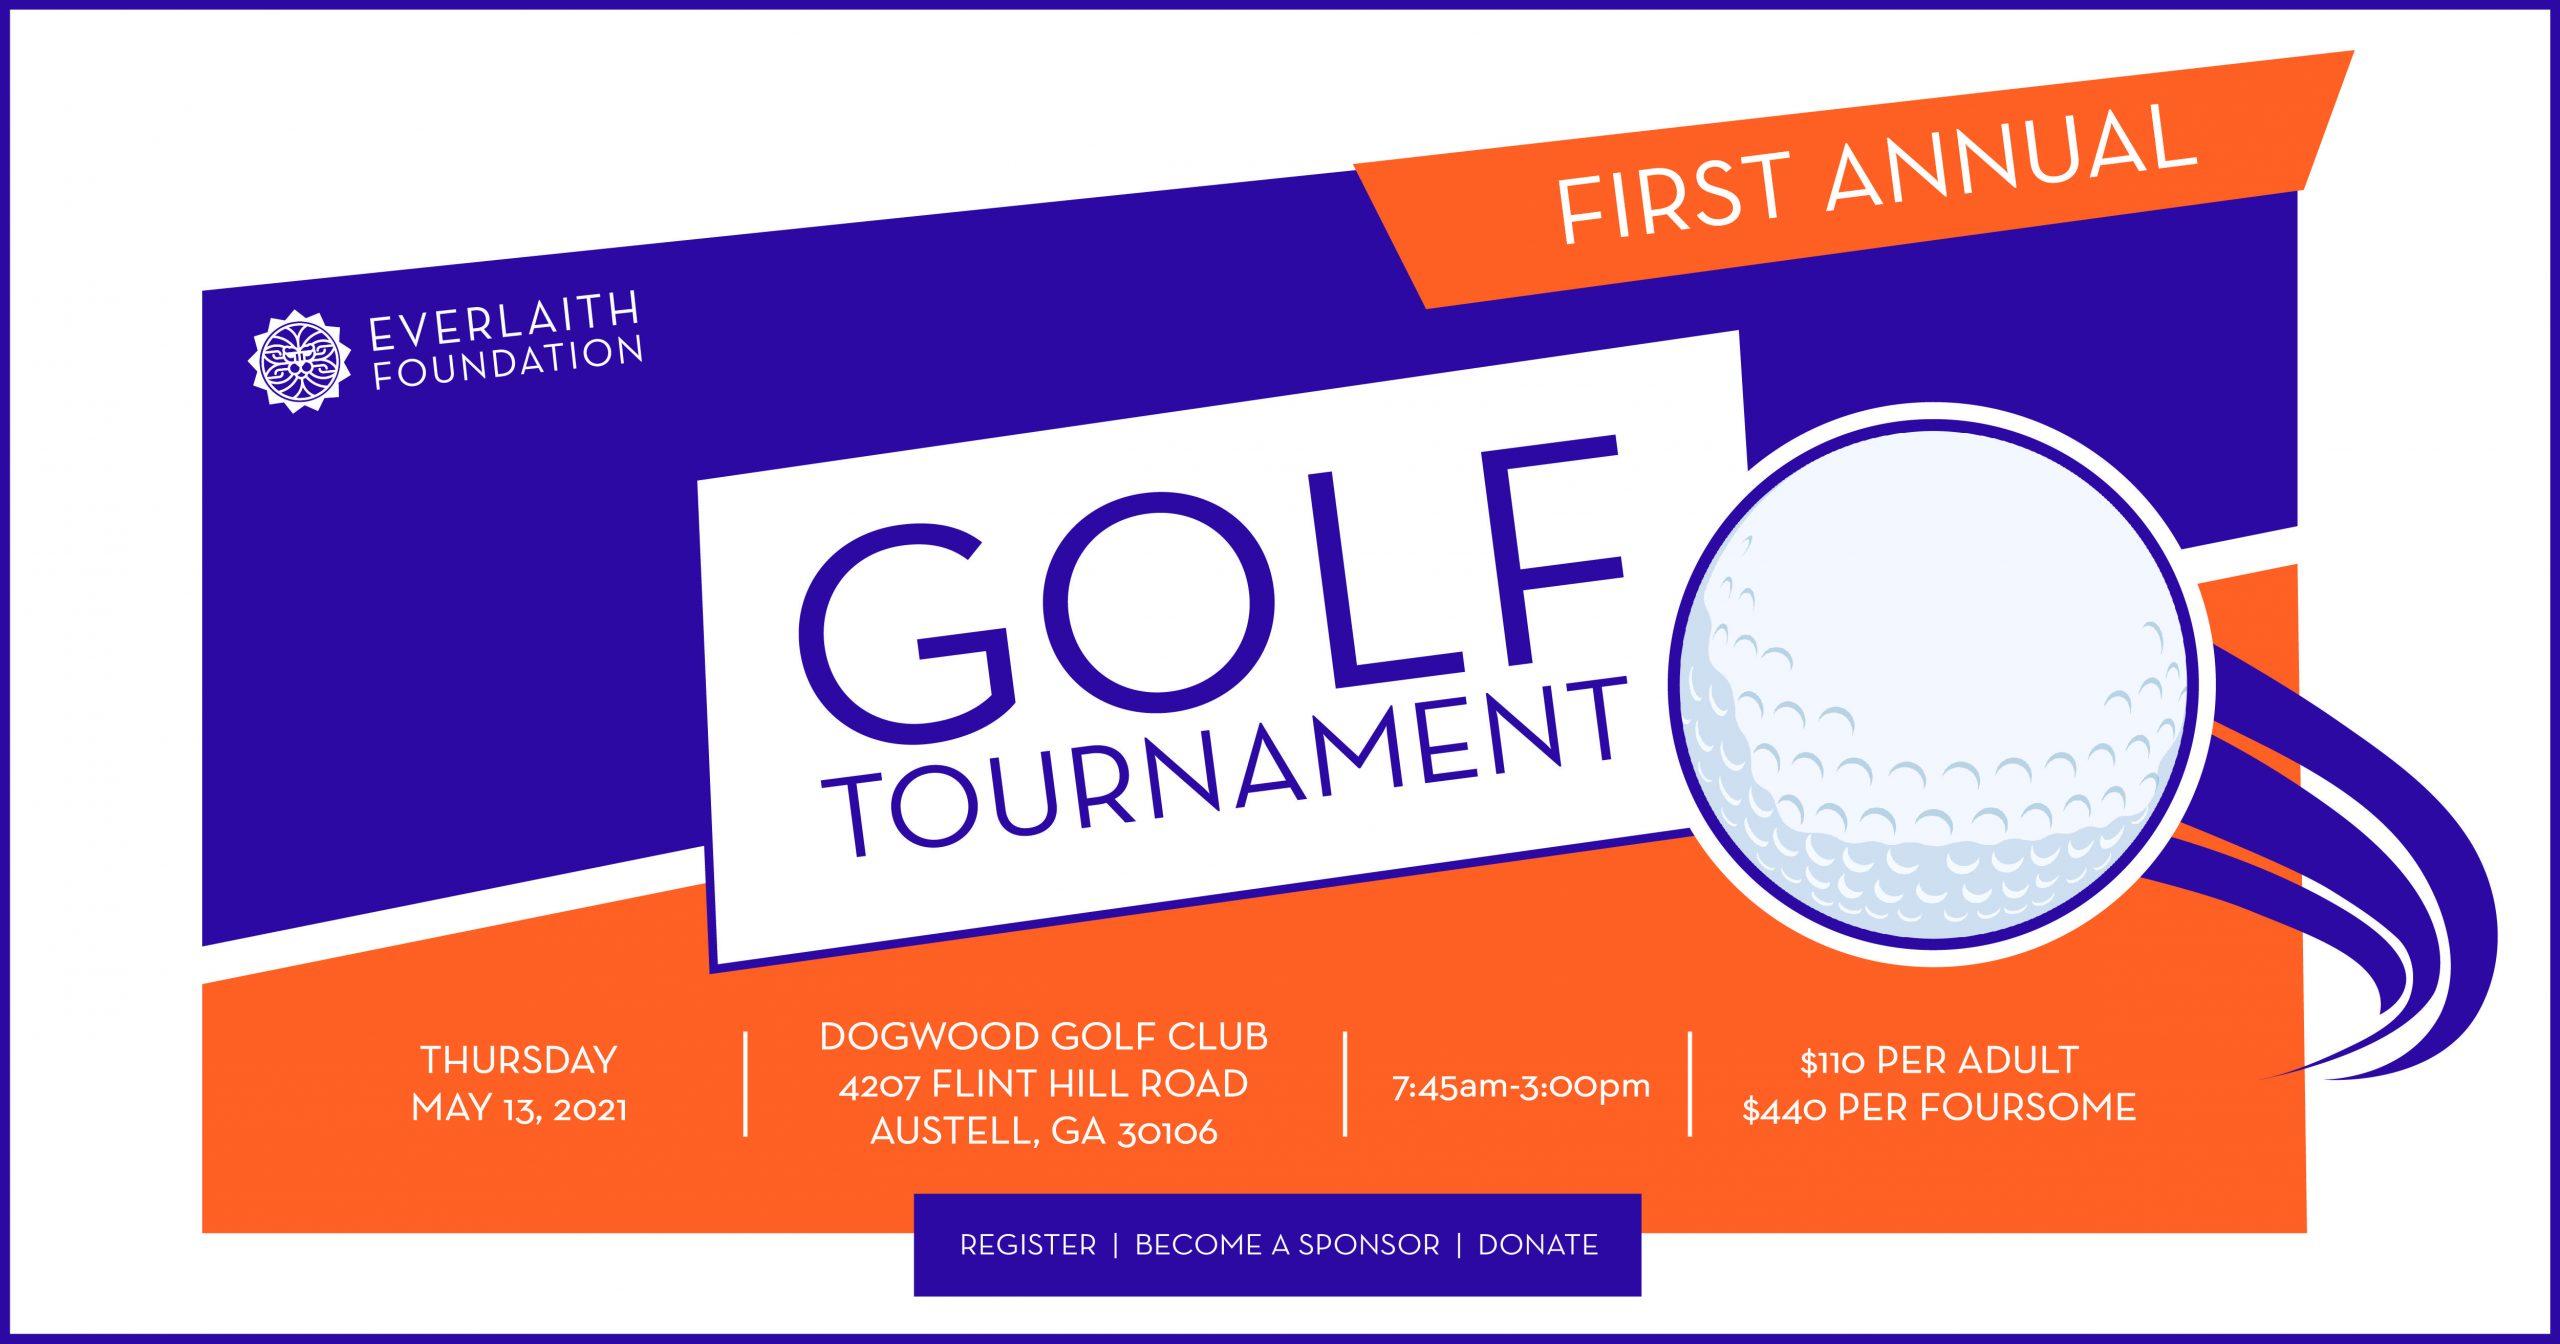 2021 EverLaith Foundation First Annual Golf Tournament